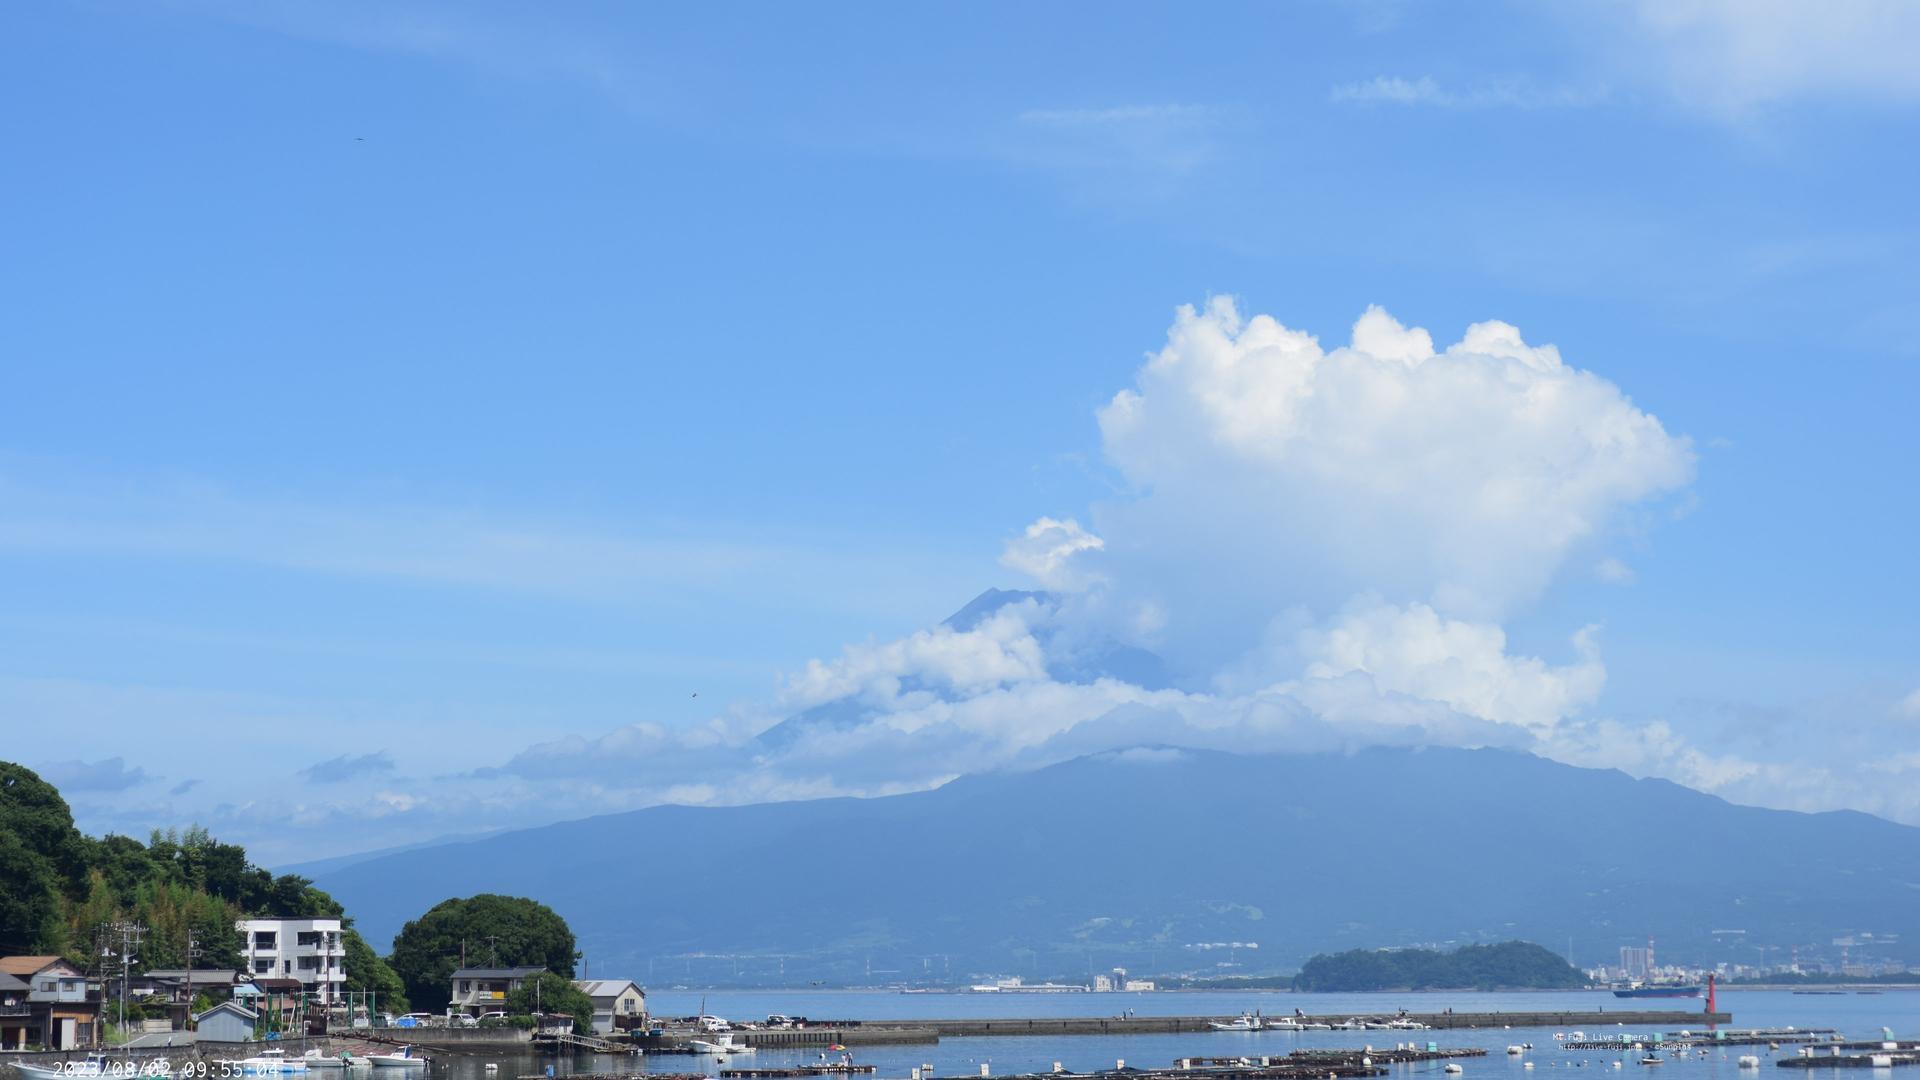 Webkamera Shishihama: Mt.Fuji from Numazu